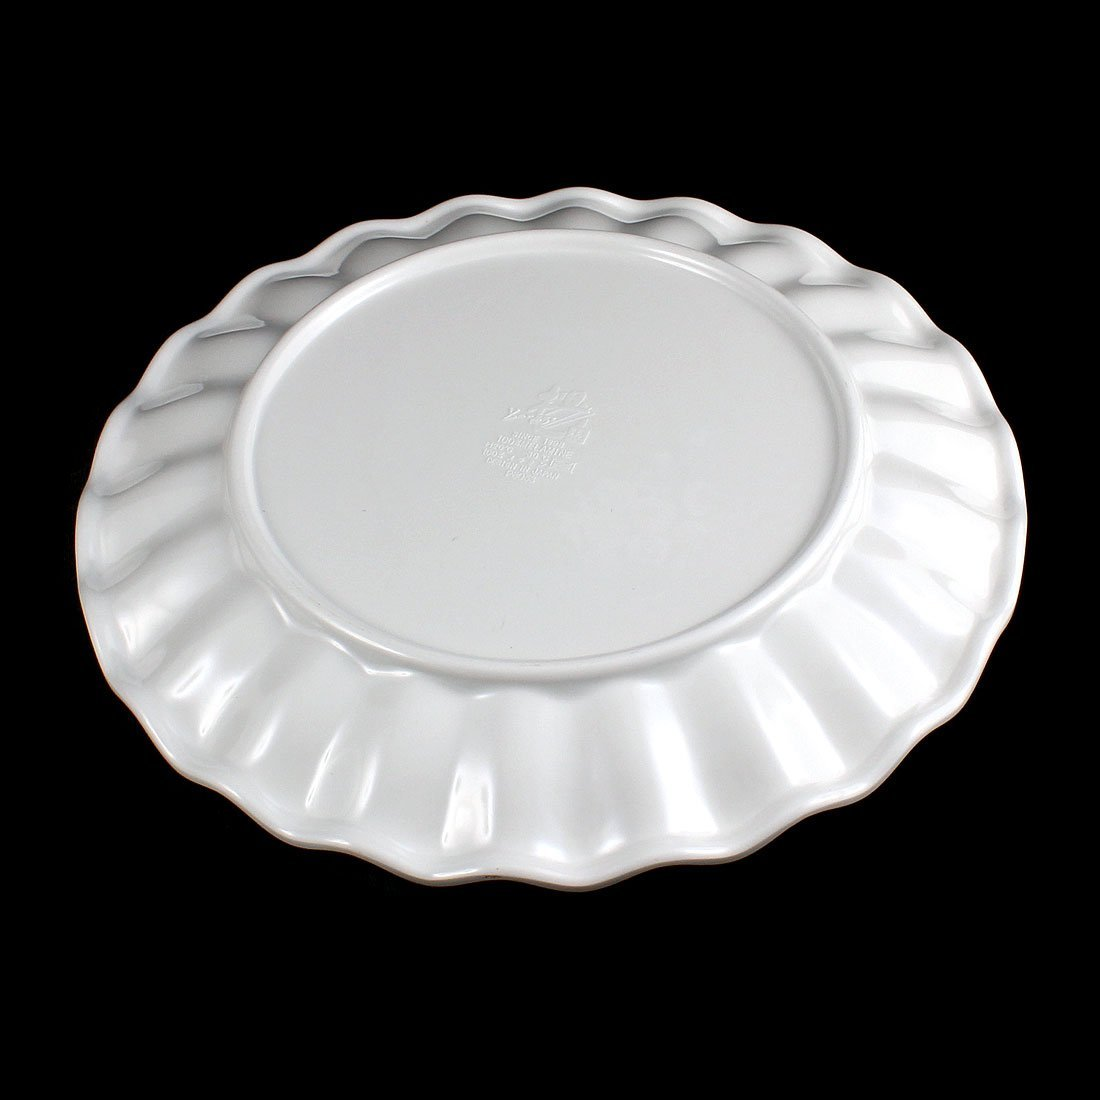 Amazon.com: DealMux borda ondulada Almoço Fruta placa prato Bandeja Louça 24, 5 centímetros Dia Branco: Kitchen & Dining